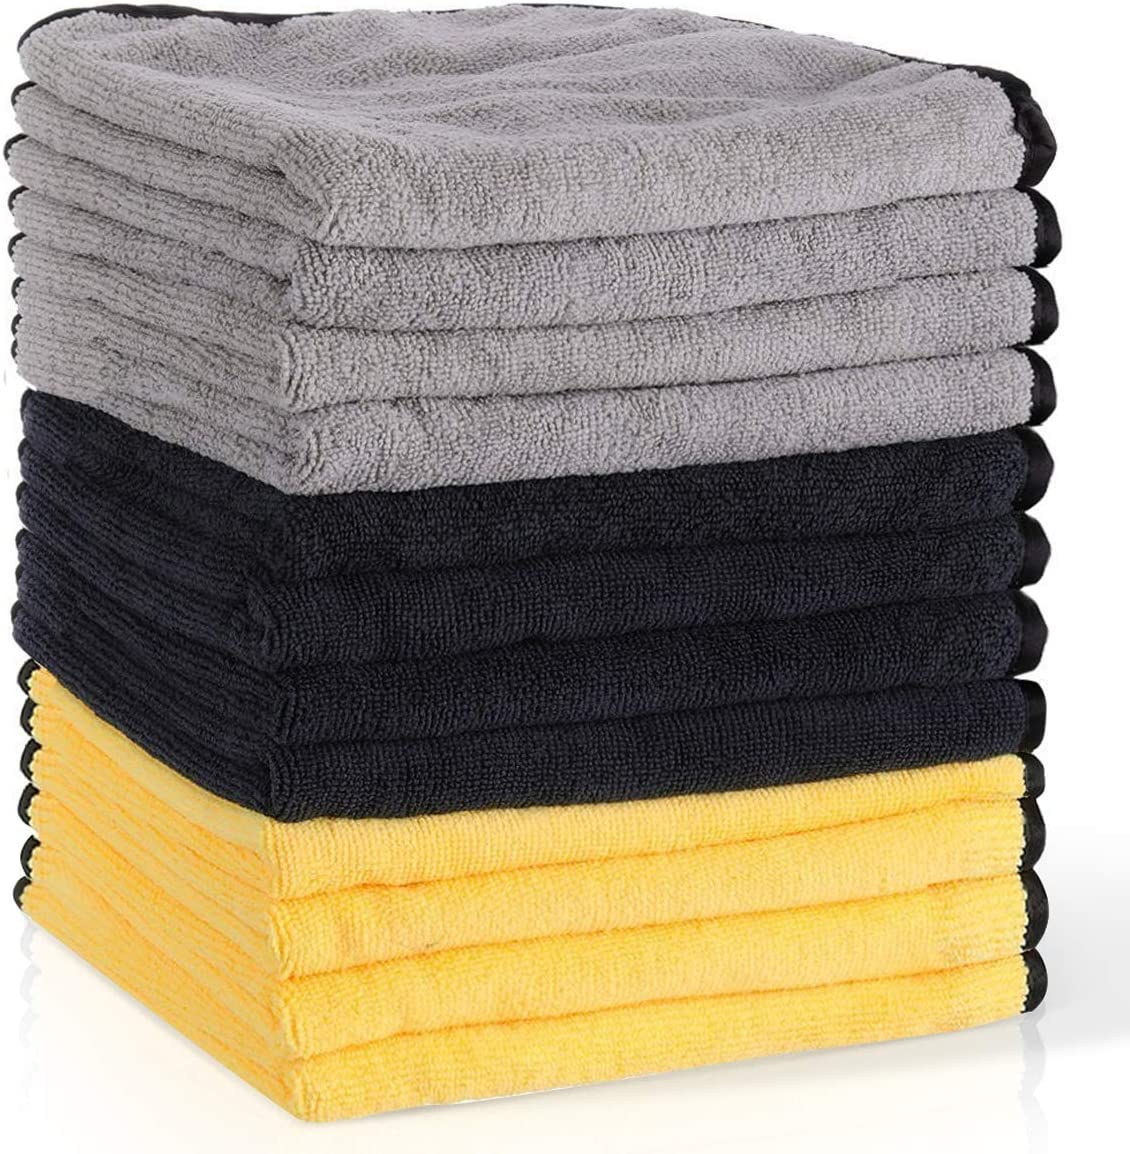 12 x Micro Fibre Cloths microfasertücher Microfibre Cloth dimensions 30 x 30 cm NEW